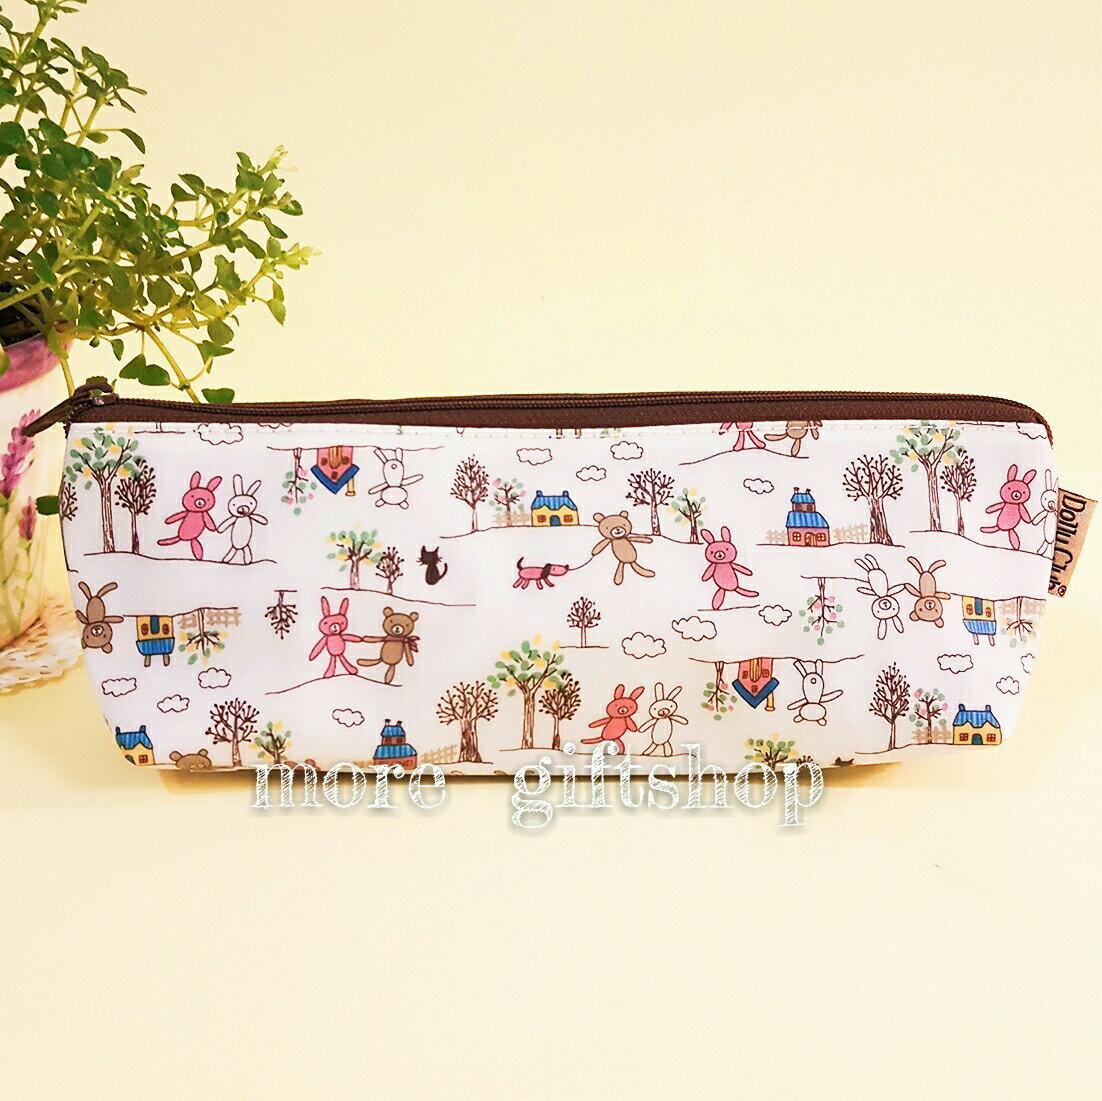 【more 禮品小舖】防水包系列 三角筆袋(米白 快樂熊)、收納包、化妝包、隨身小物